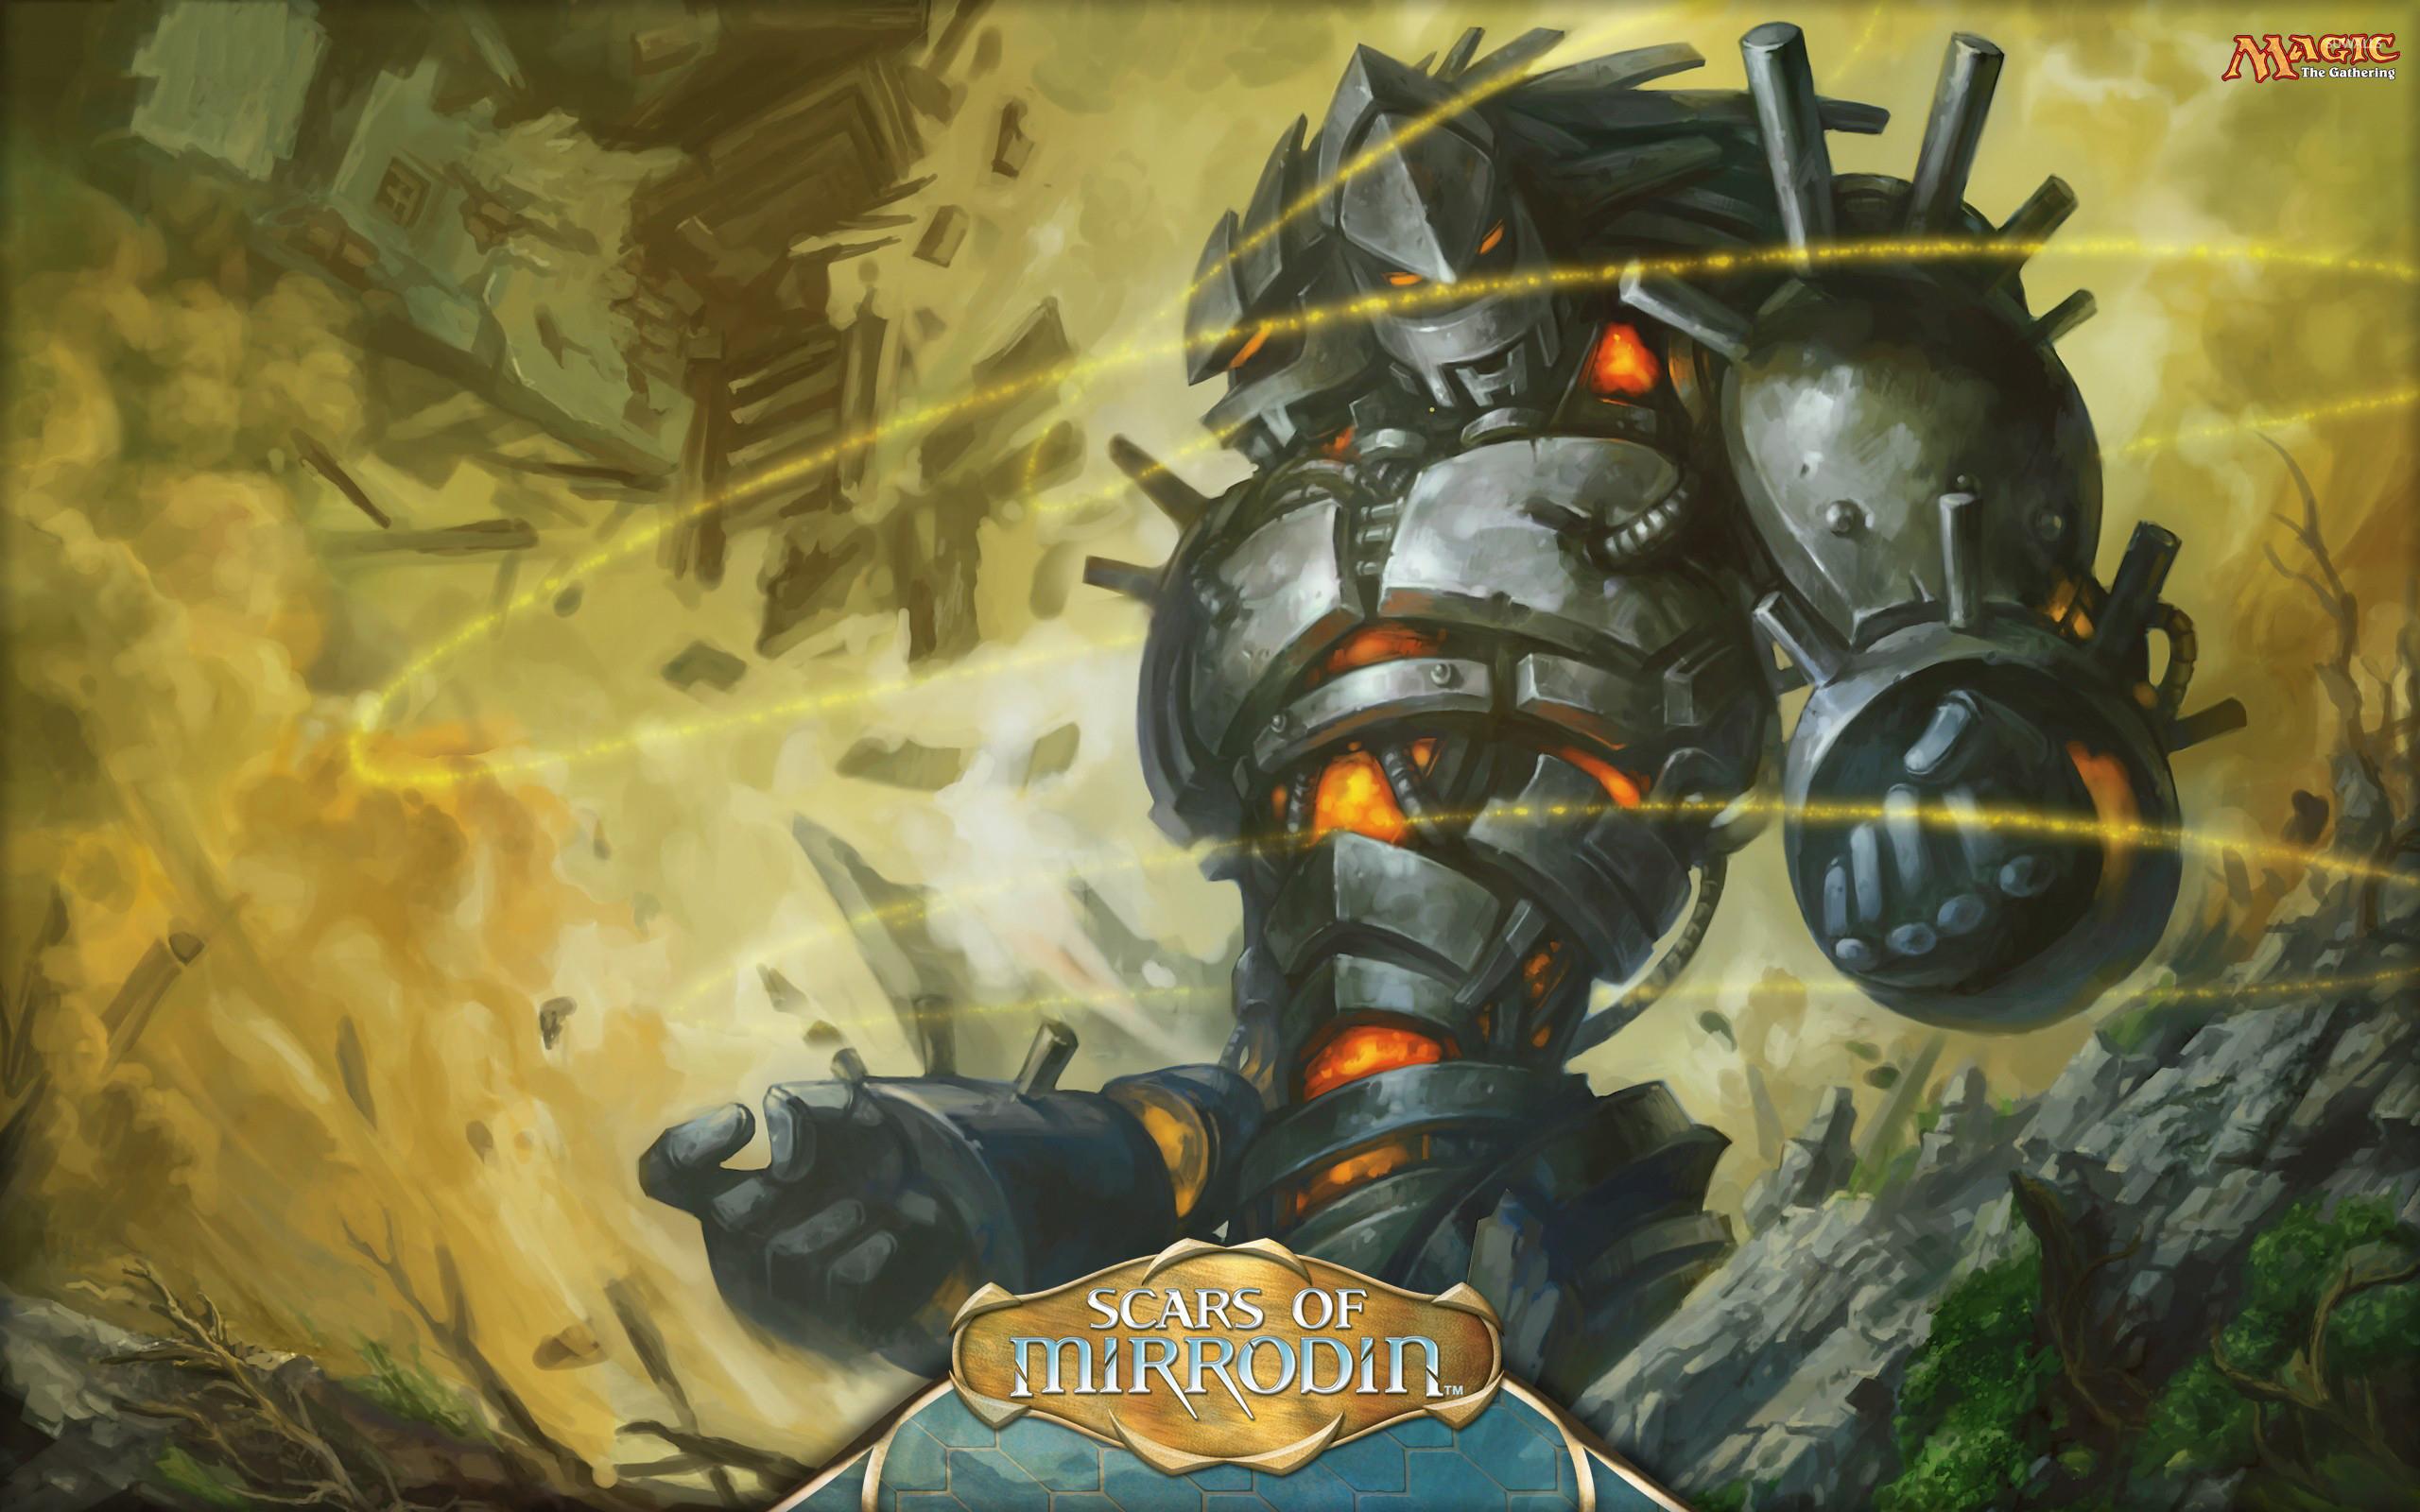 Darksteel Sentinel – Magic: The Gathering wallpaper jpg